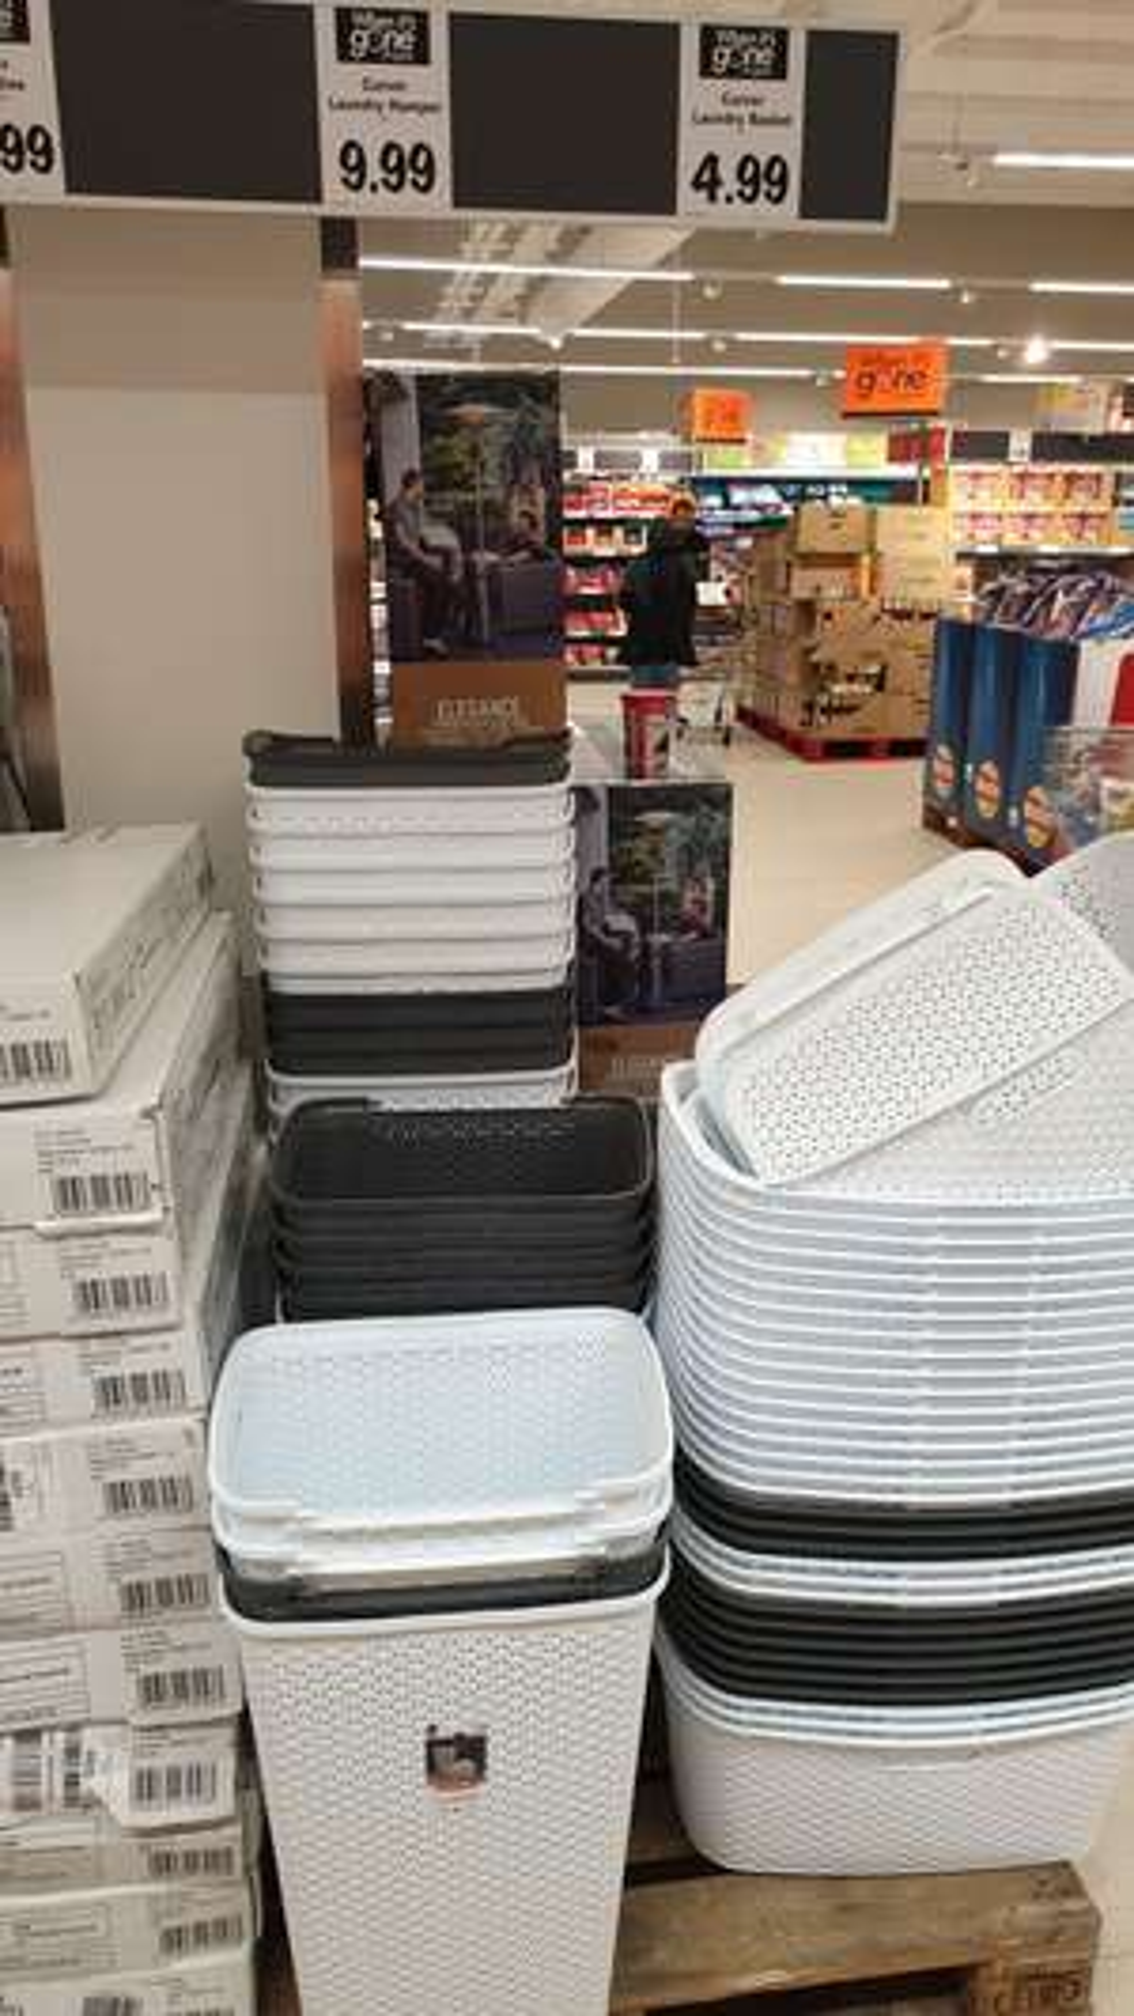 Curver laundry hamper £9.99 / basket £4.99 @ Lidl harrow weald